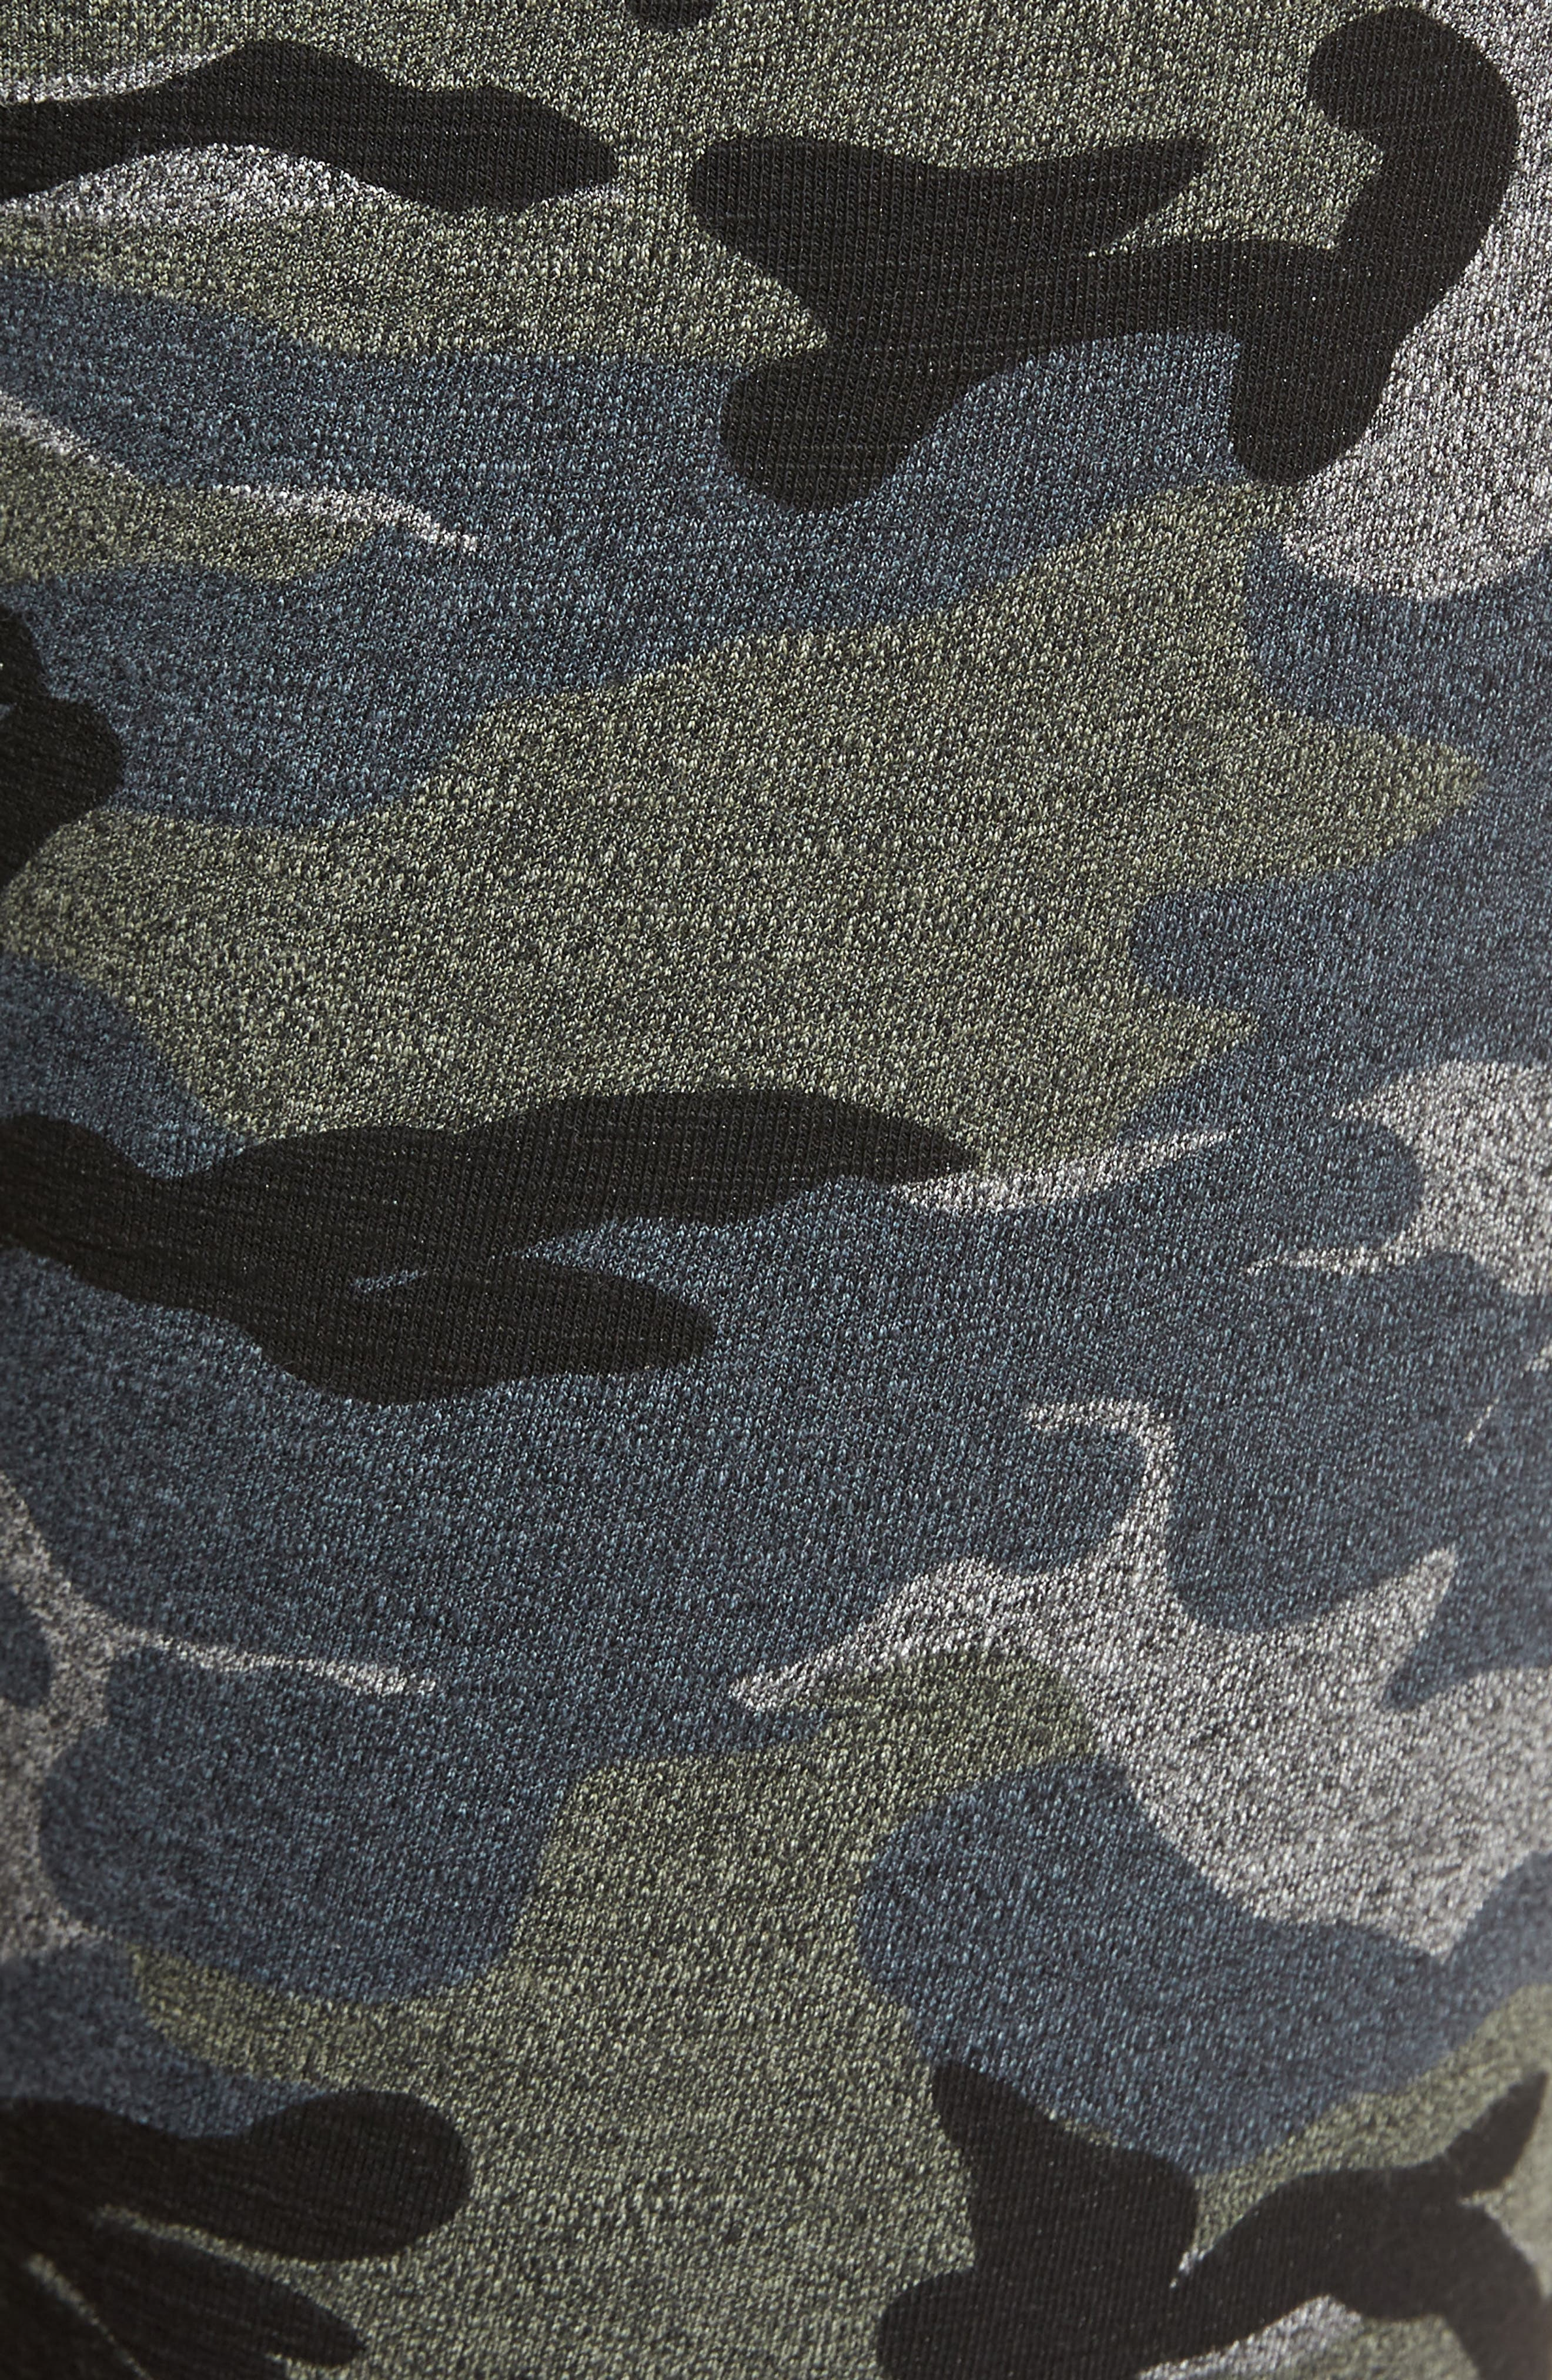 Stripe Camo Yoga Pants,                             Alternate thumbnail 6, color,                             020